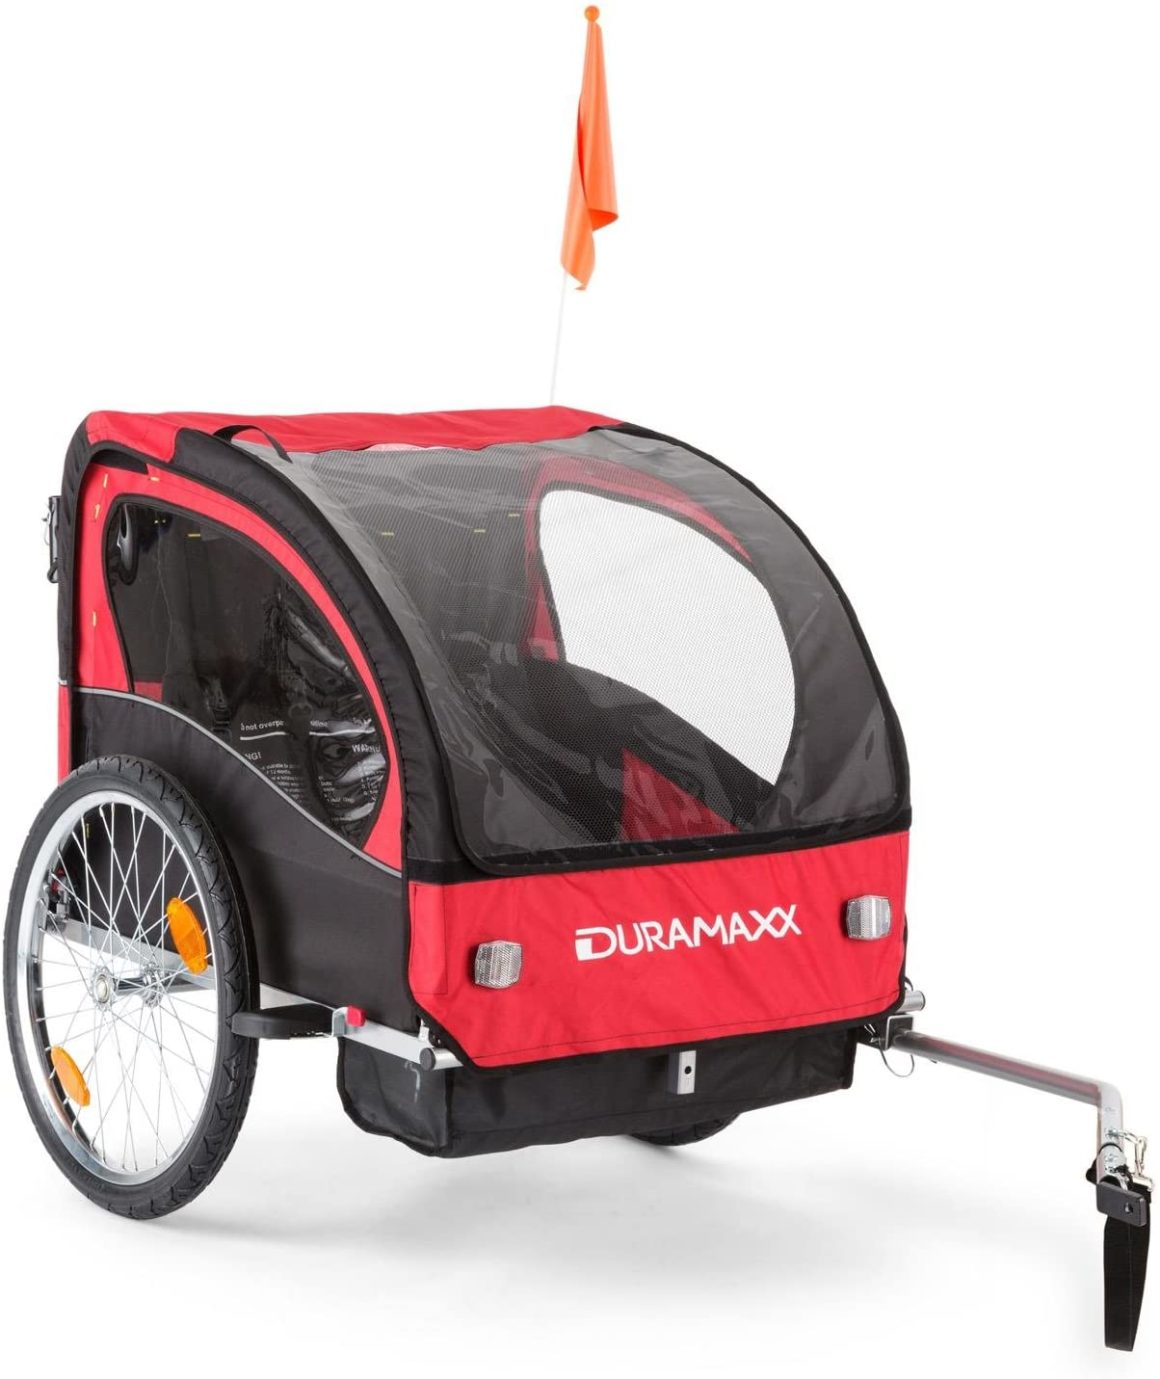 Duramaxx Trailer Trailer Swift 2-in-1 Buggy Bike per bambini e neonati 2 posti